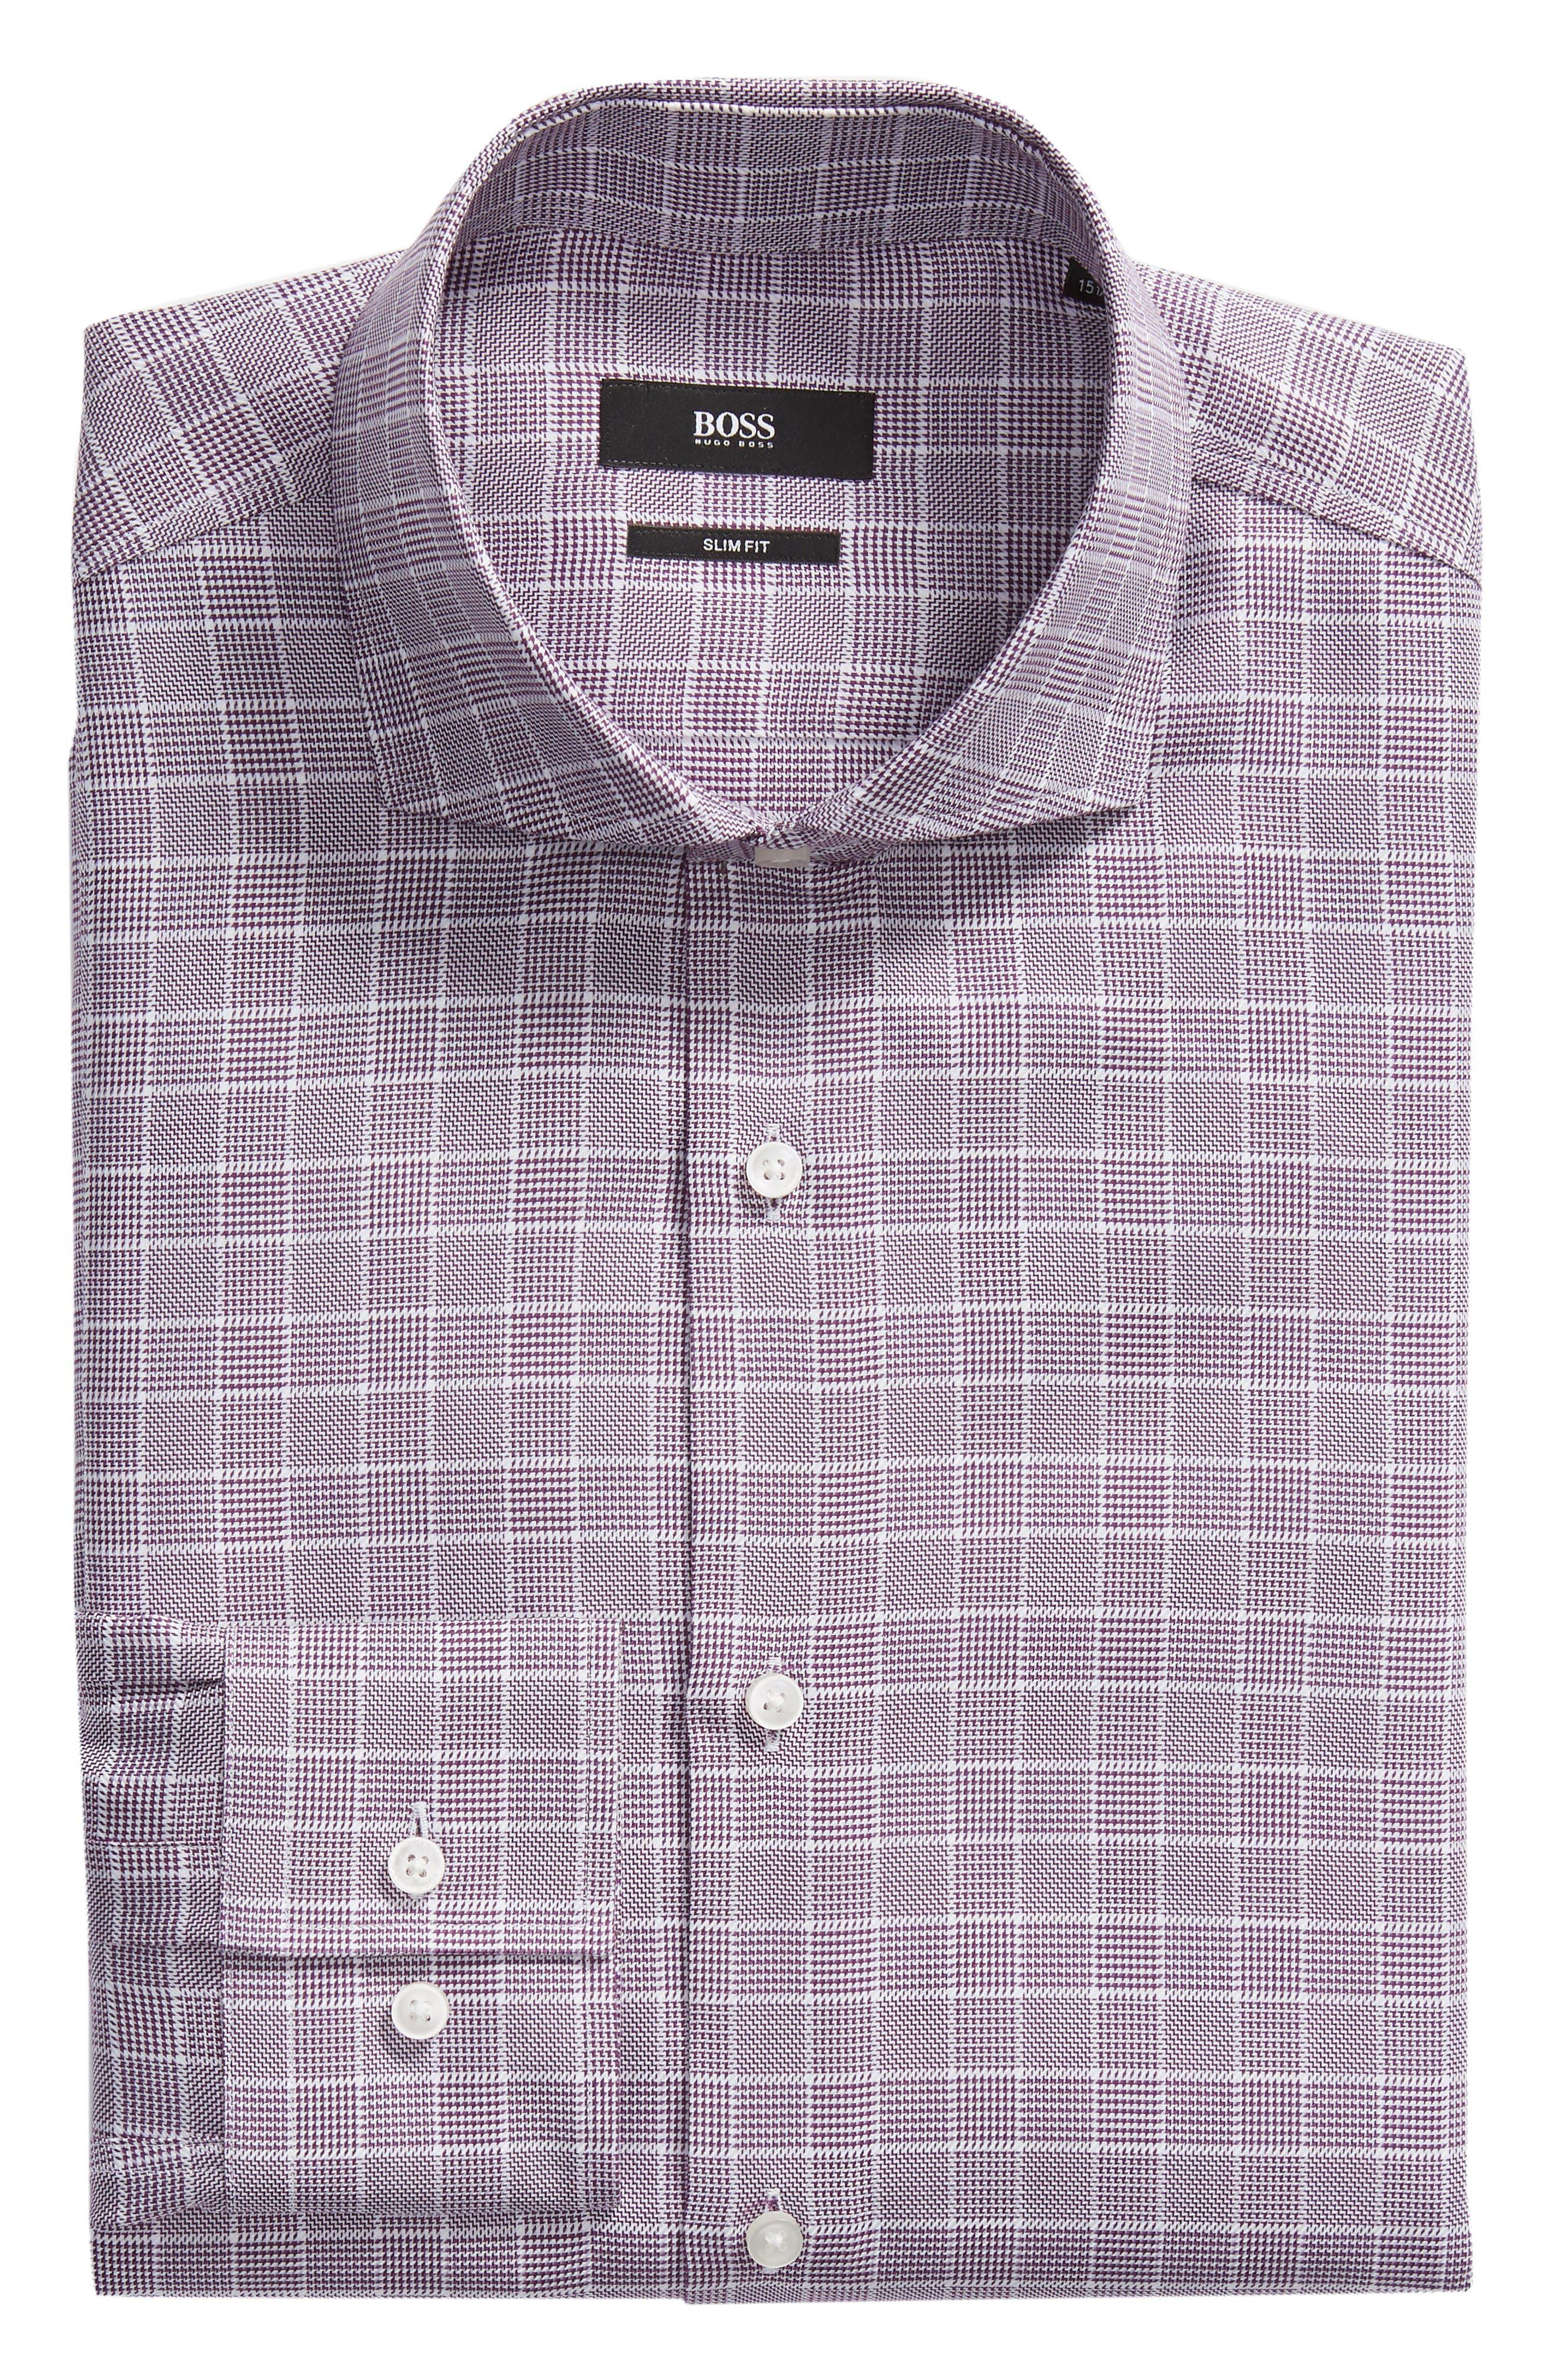 Jason Slim Fit Plaid Dress Shirt,                             Alternate thumbnail 5, color,                             504 PURPLE